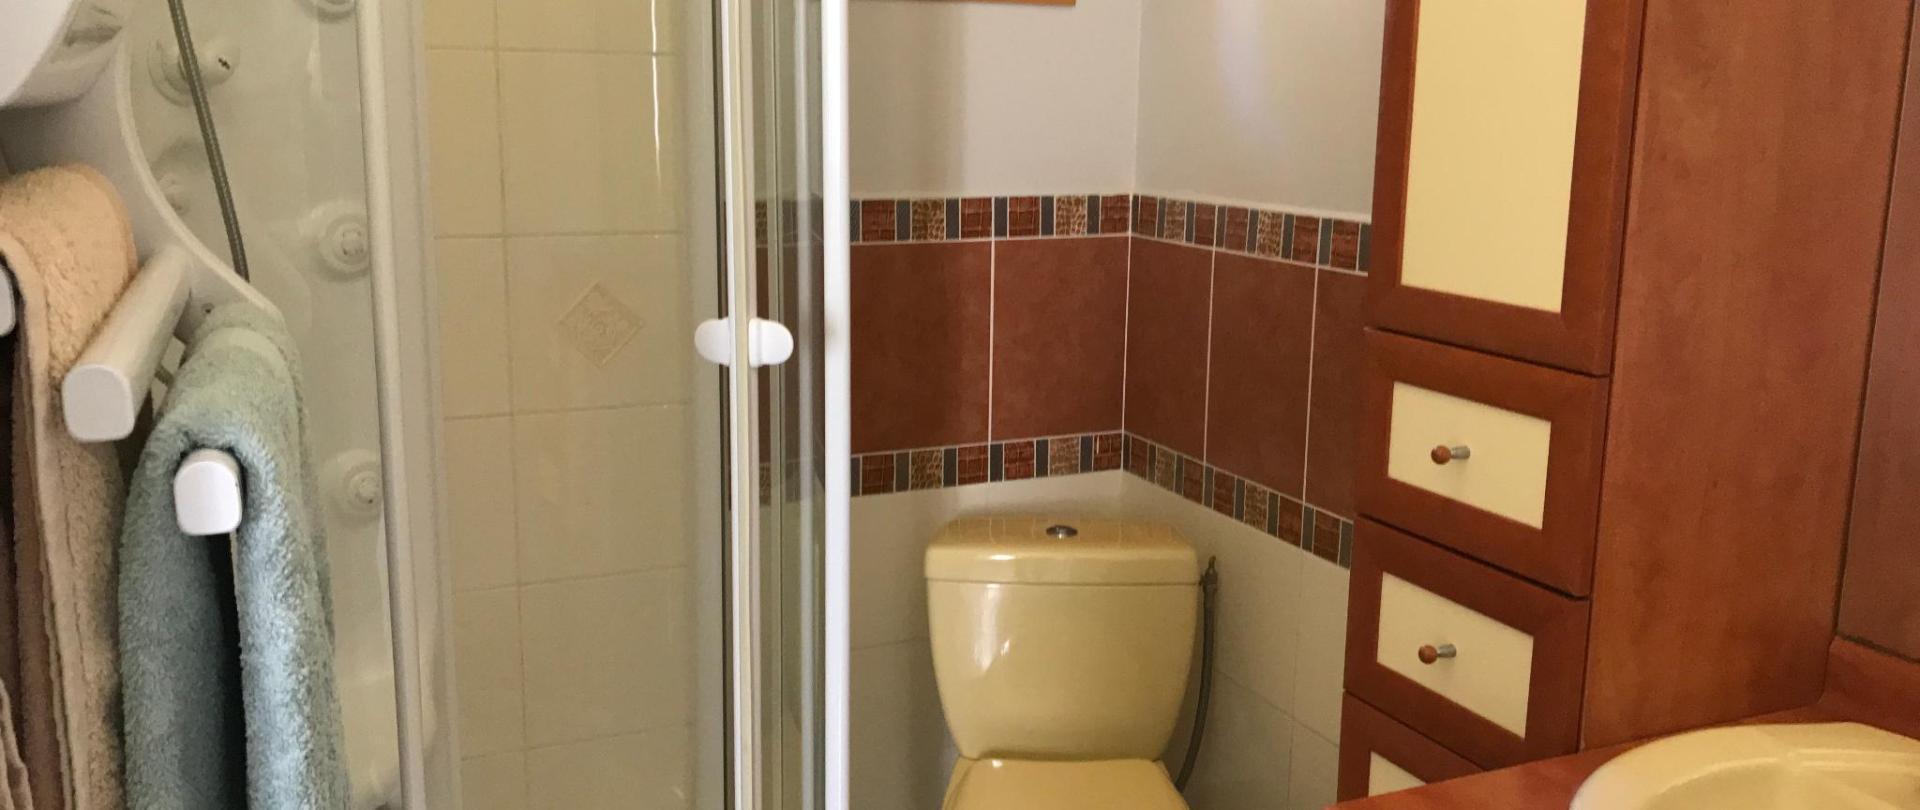 salle d'eau chambre Cassis 6.1.JPG